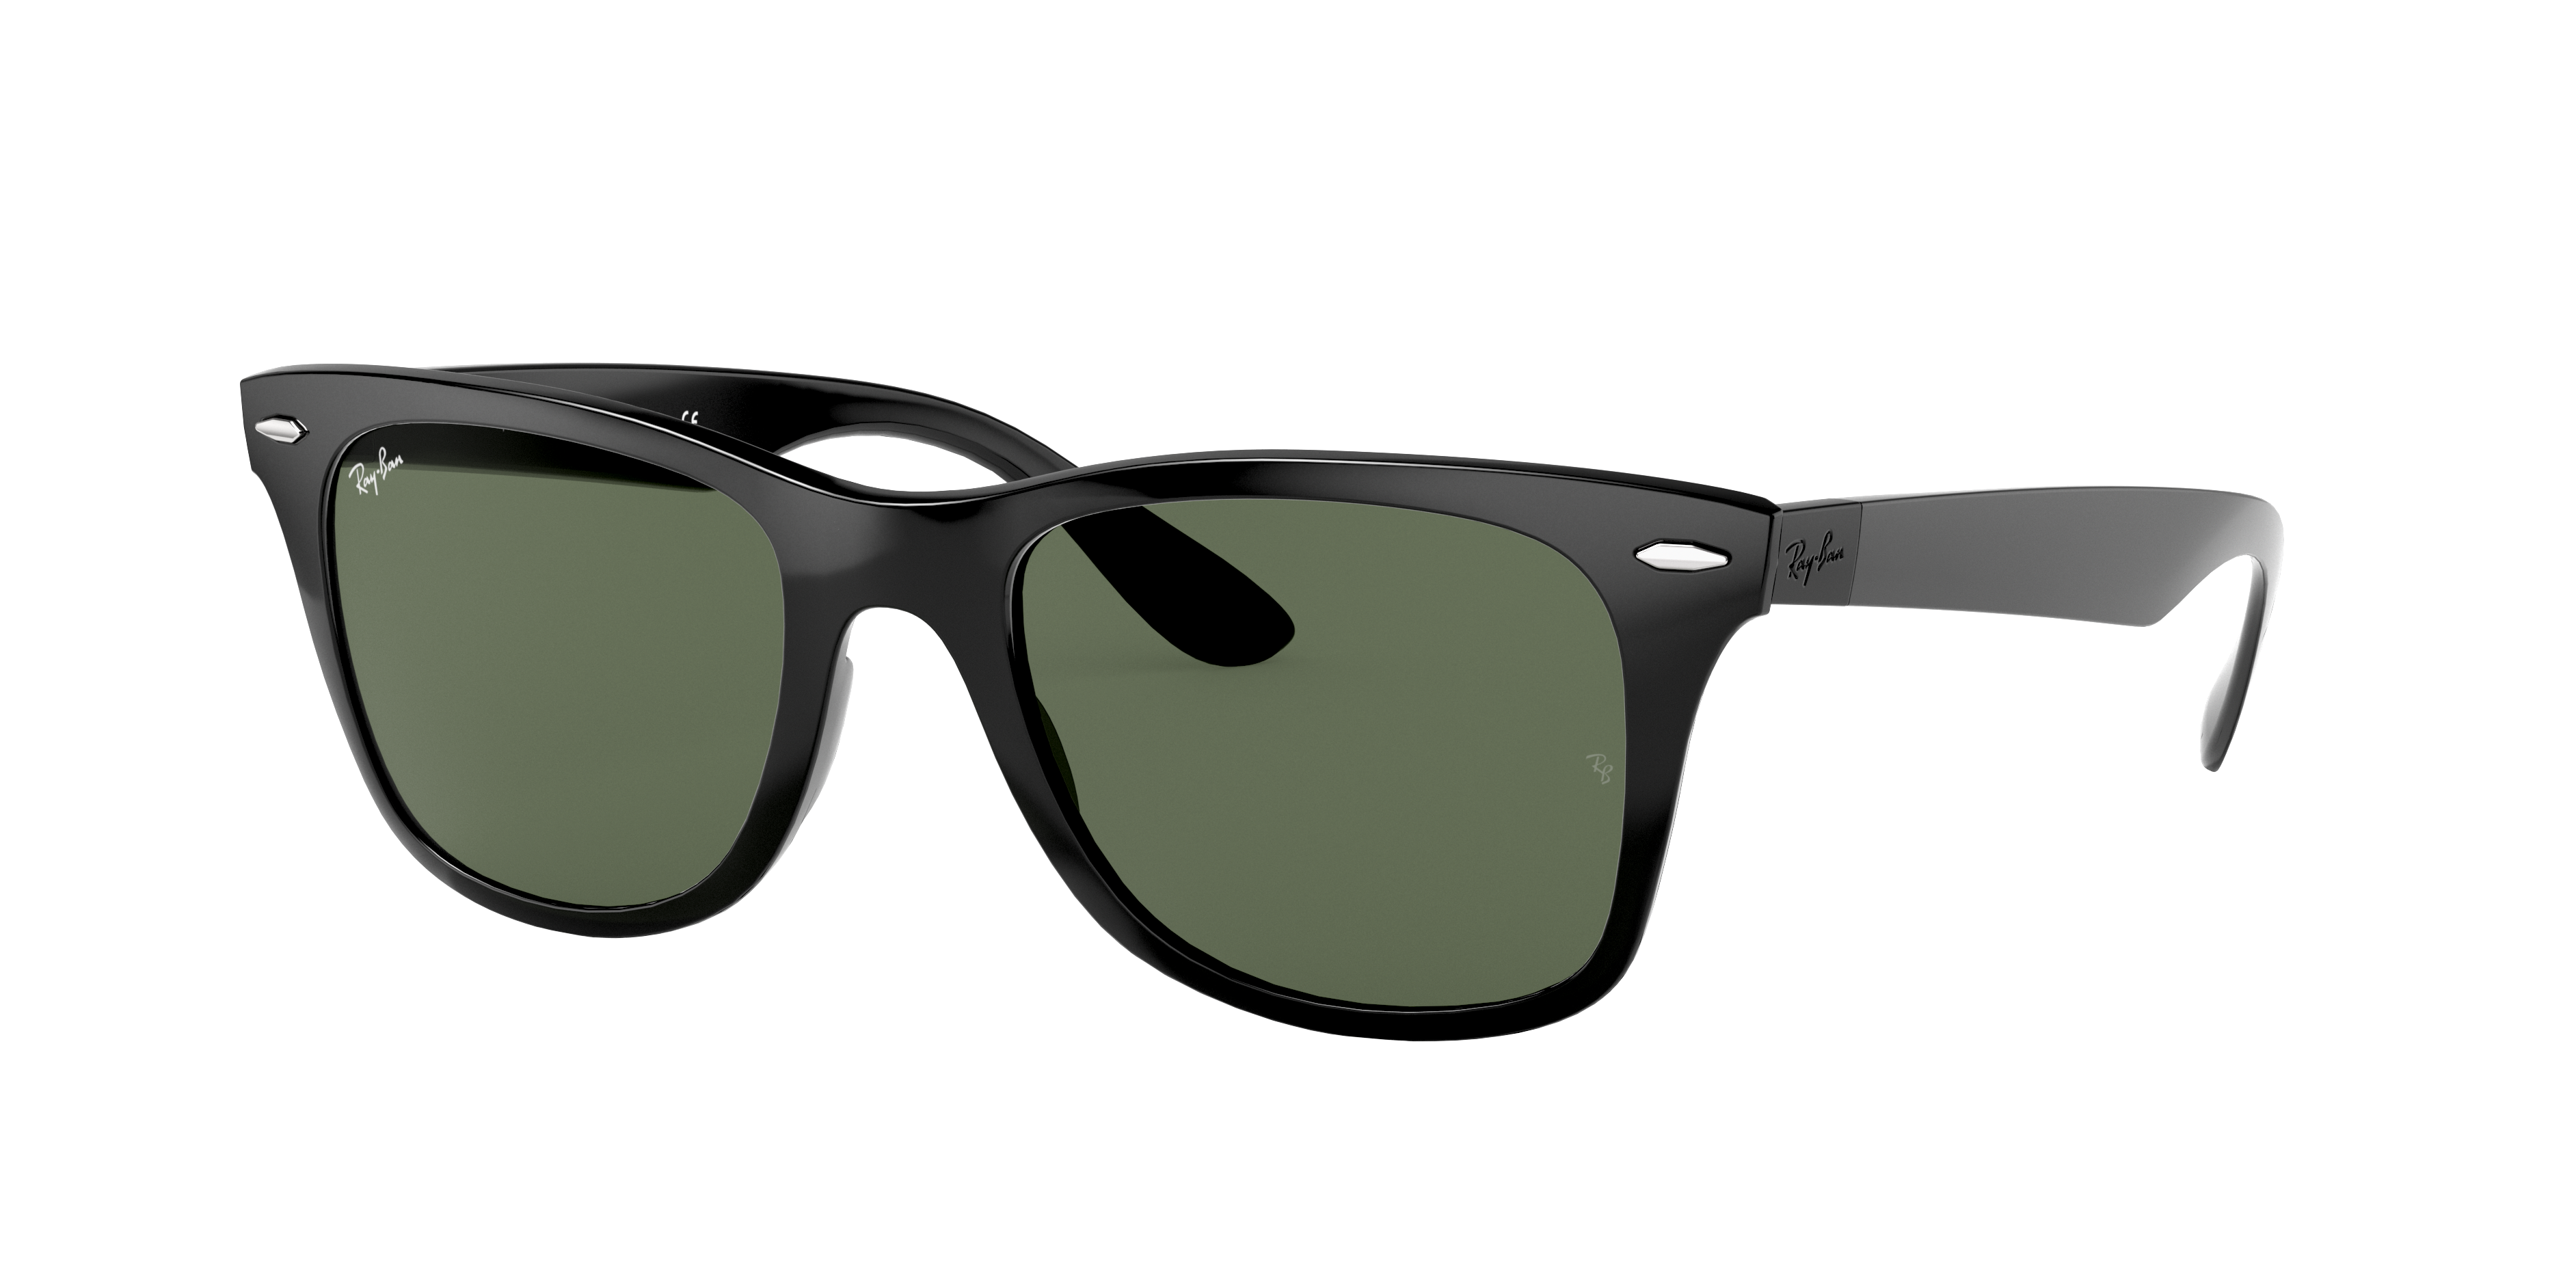 Ray-Ban Wayfarer Liteforce Low Bridge Fit Black, Green Lenses - RB4195F